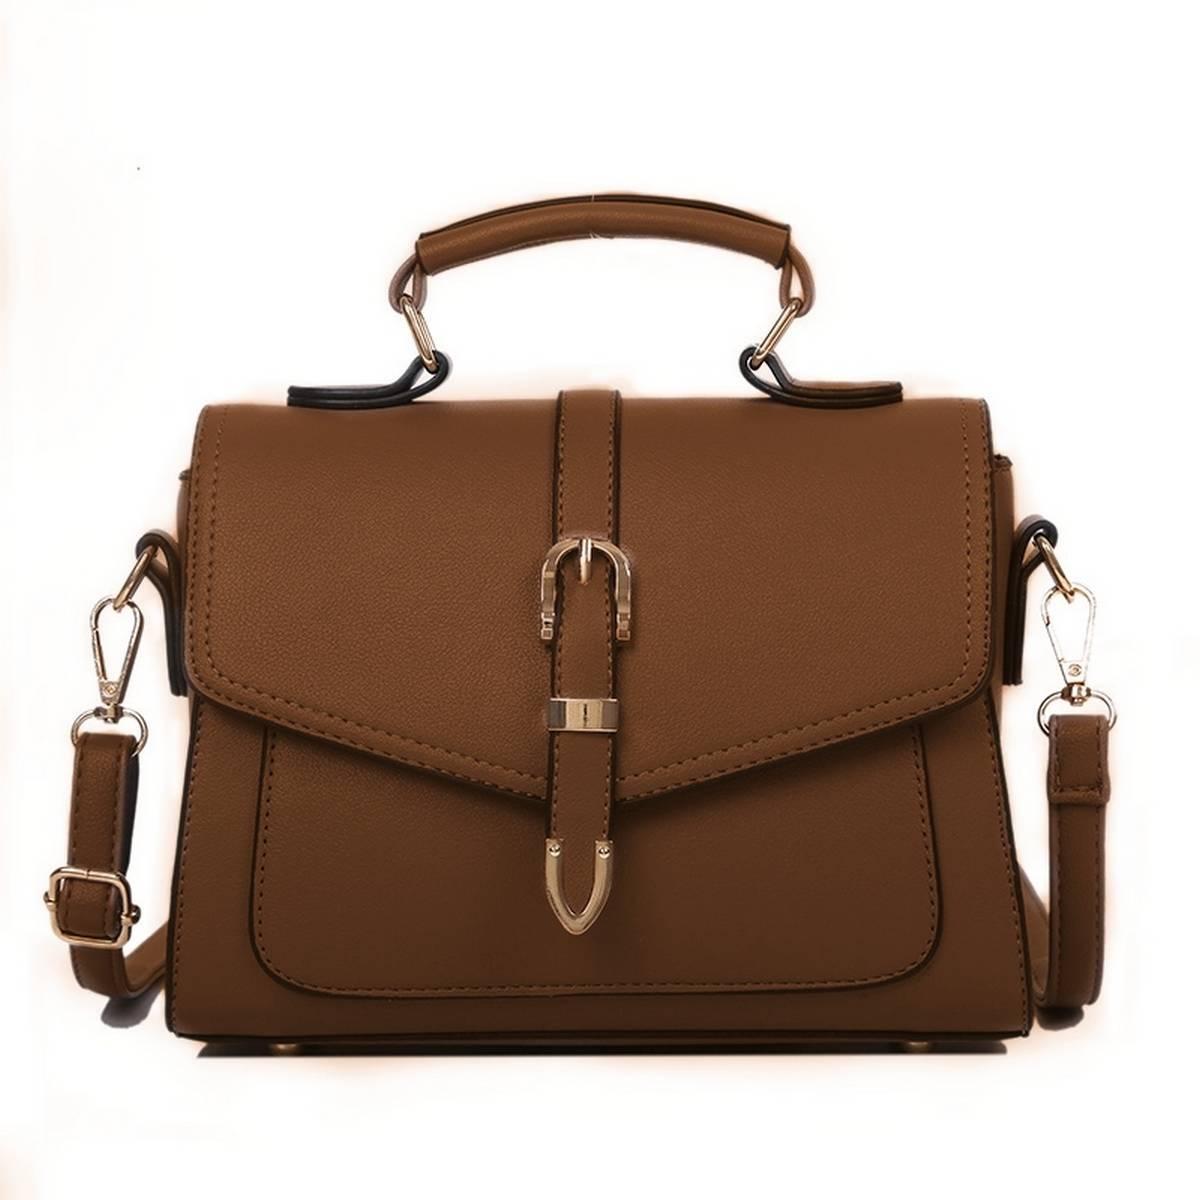 Handbags for Girls, Women, Ladies, Tote Bag, Purse and Shoulder Bag